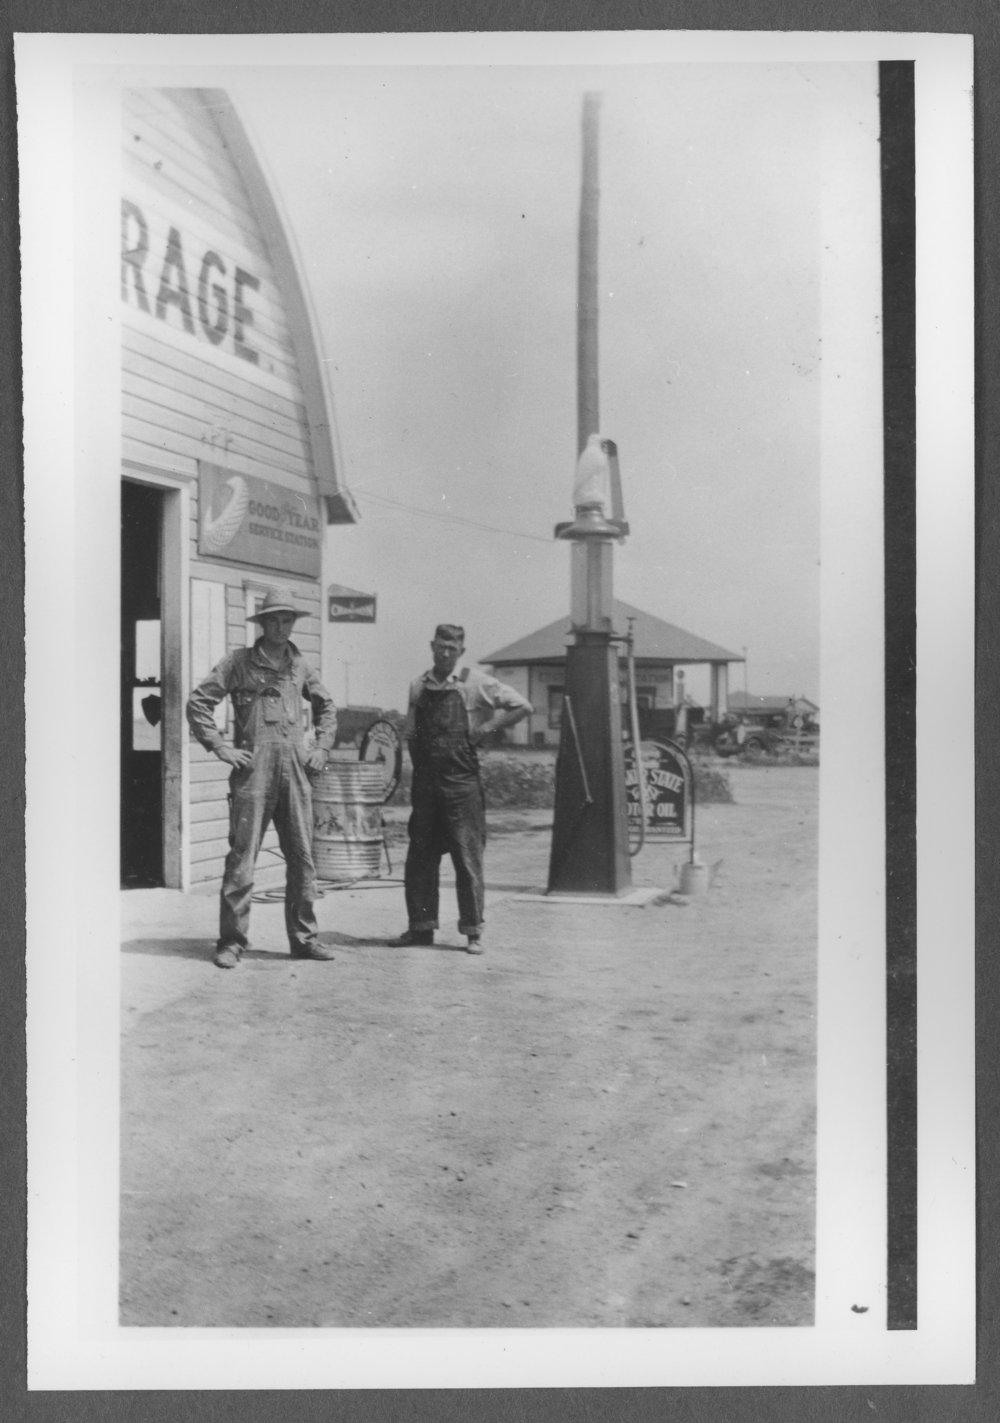 Scenes of Sherman County, Kansas - Edson's Garage